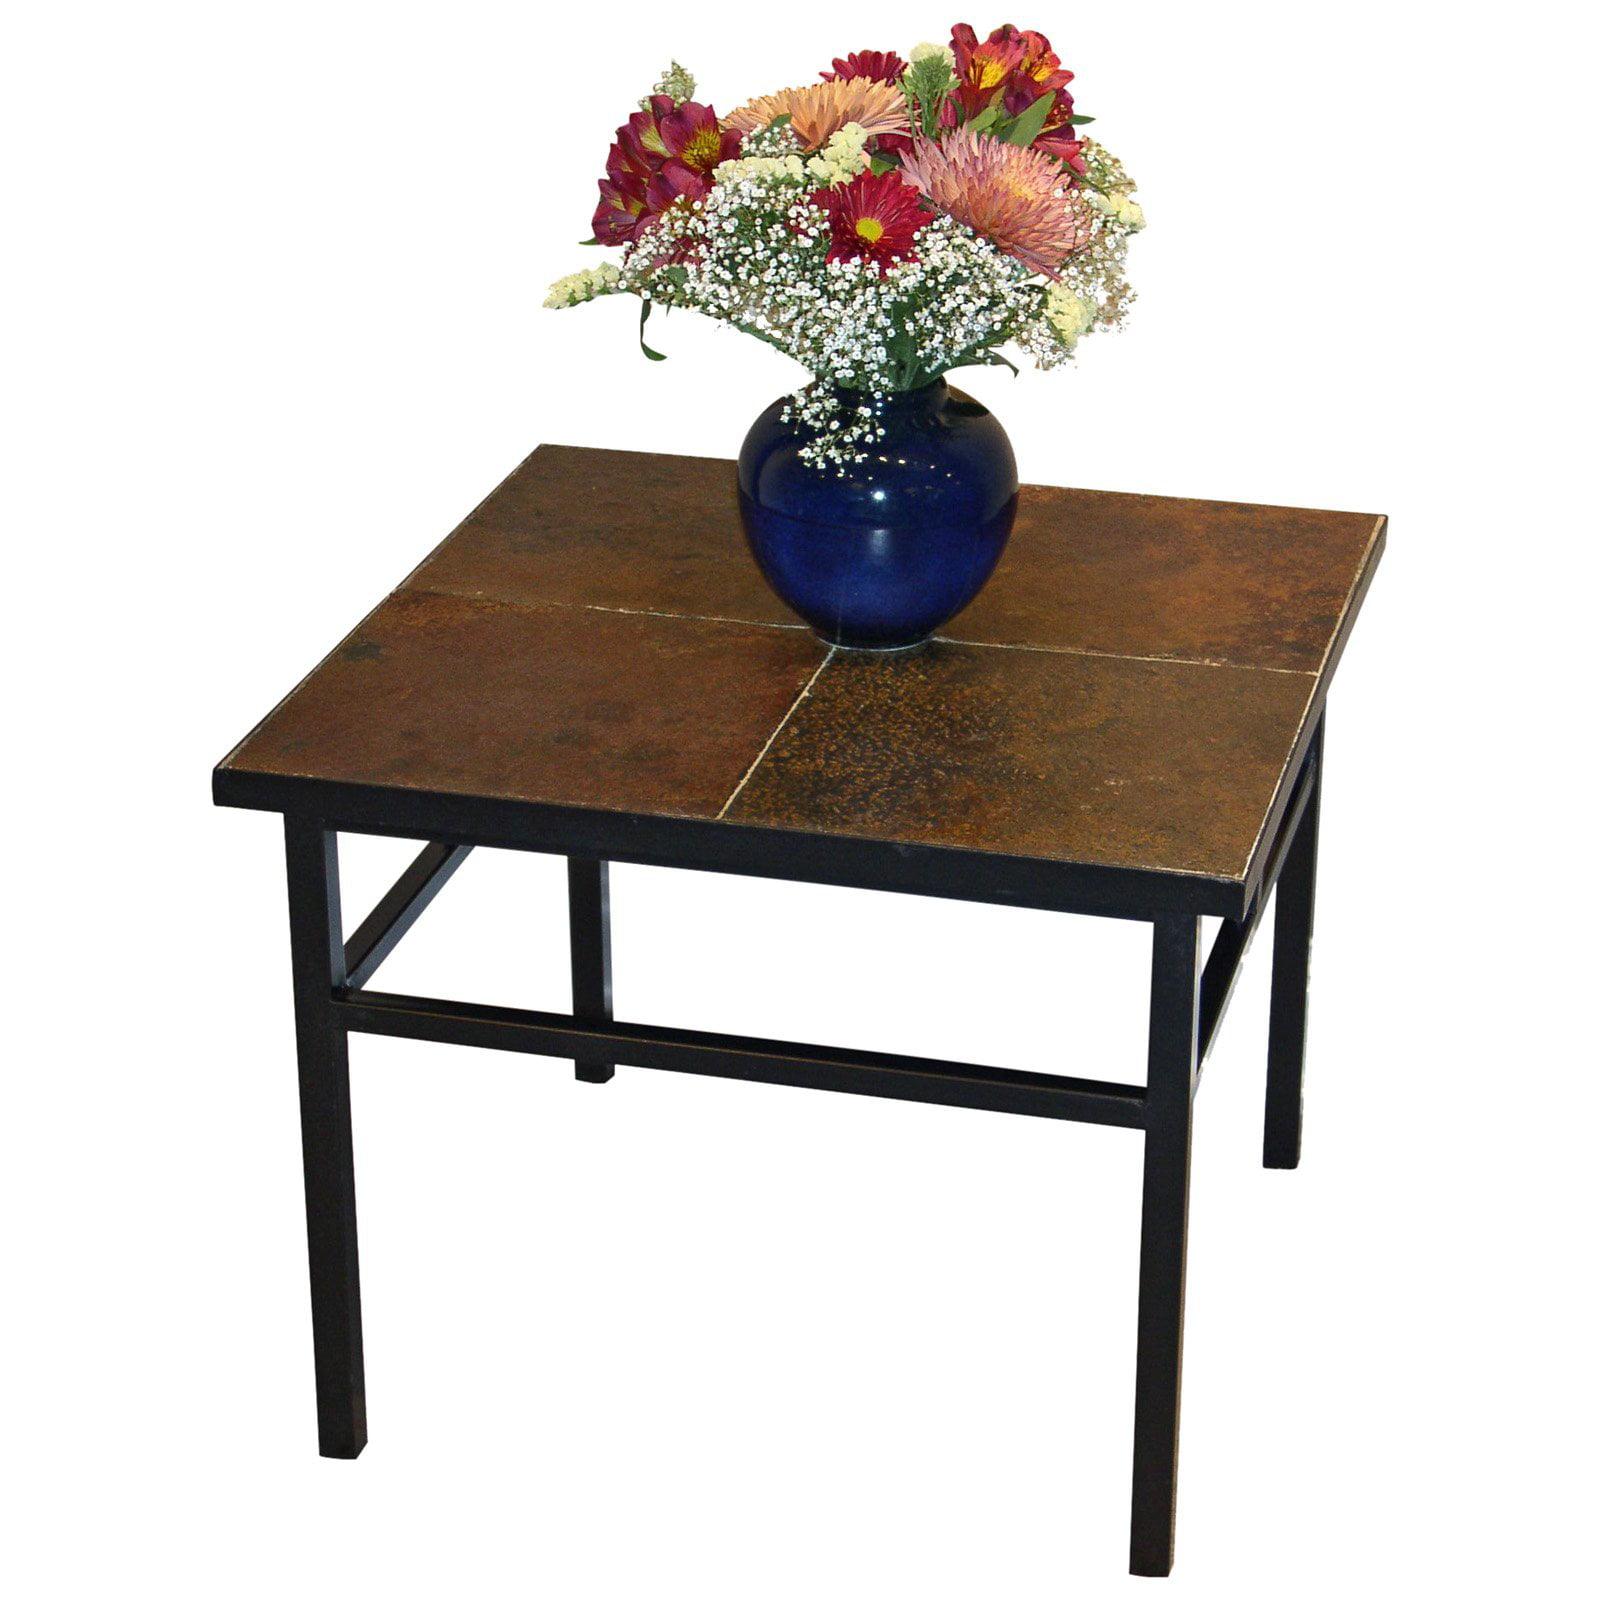 4D Concepts Slate End Table by 4D Concepts